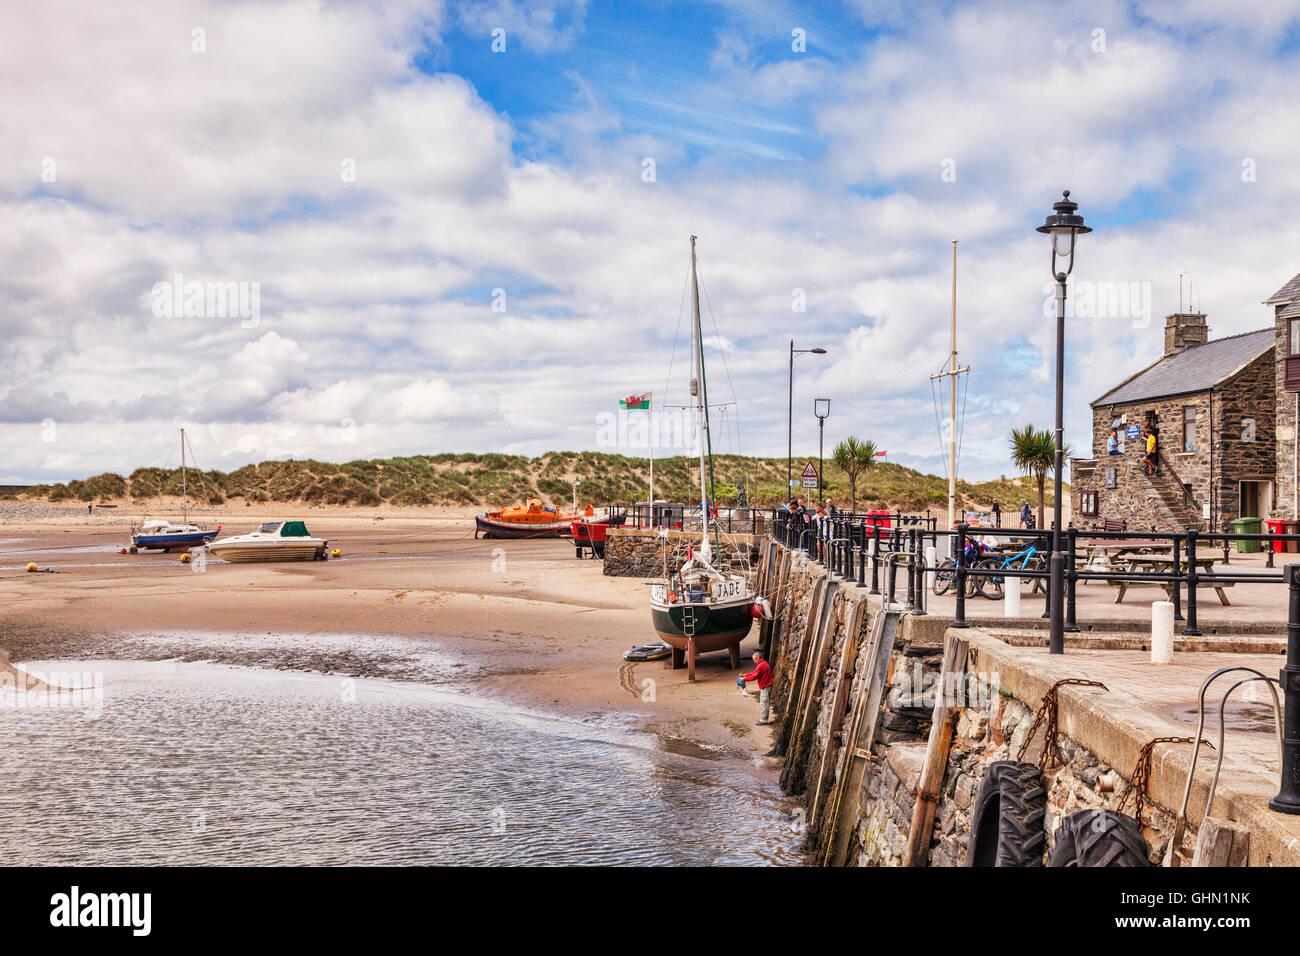 Barmouth Quay at low tide, Gwynedd, Wales, UK - Stock Image